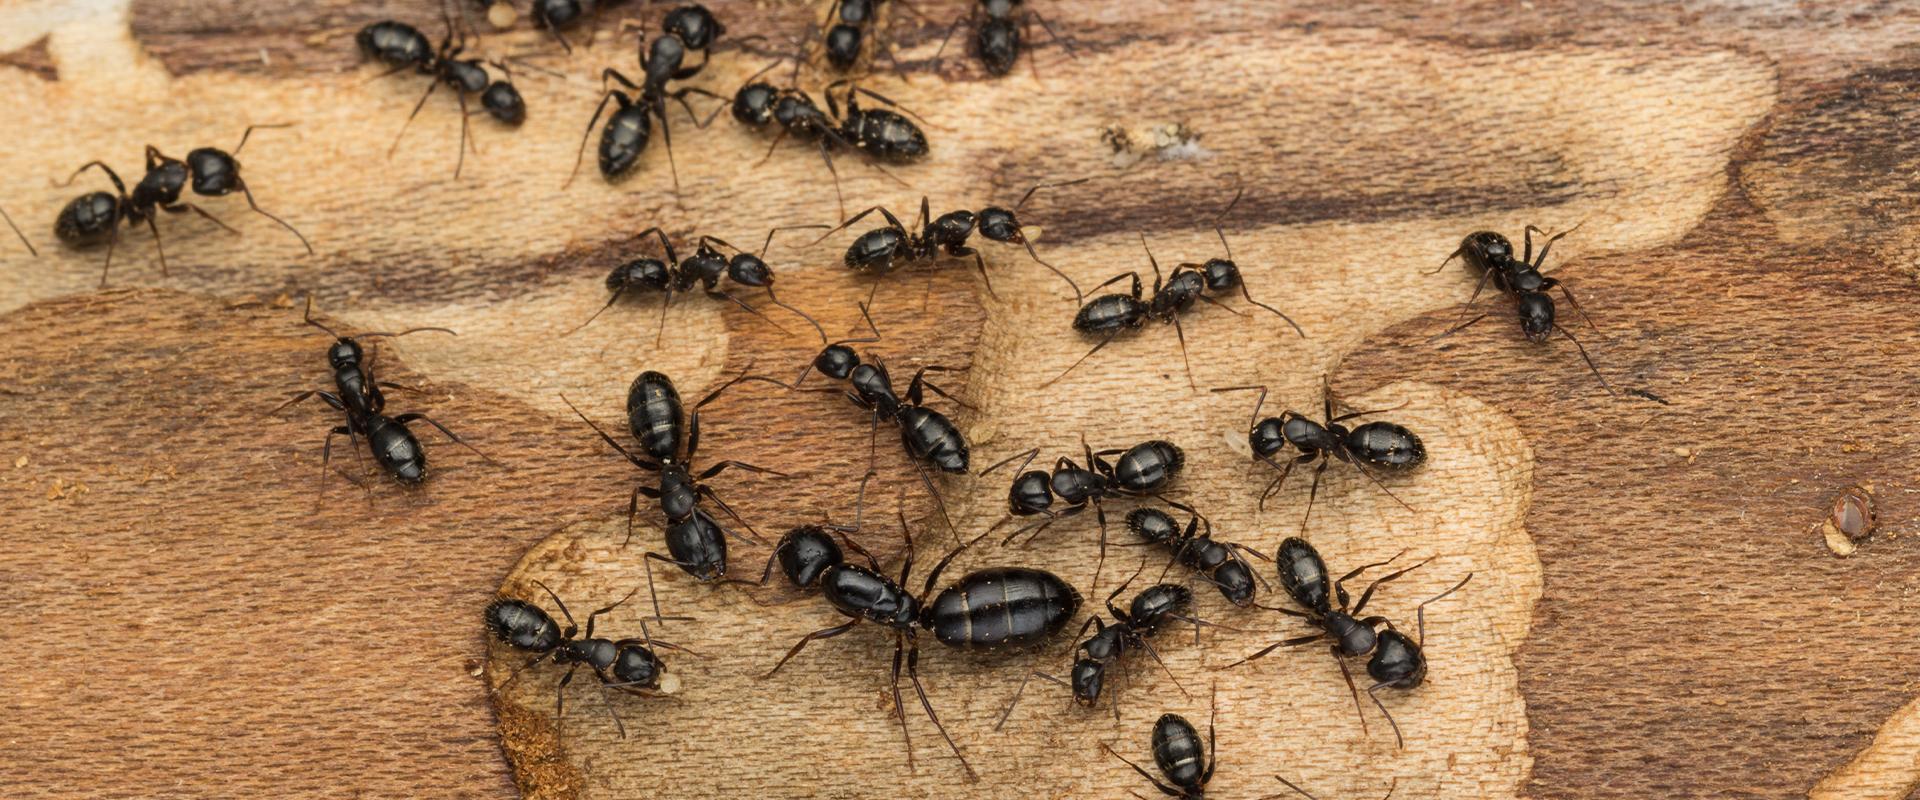 ants on a log in idaho falls